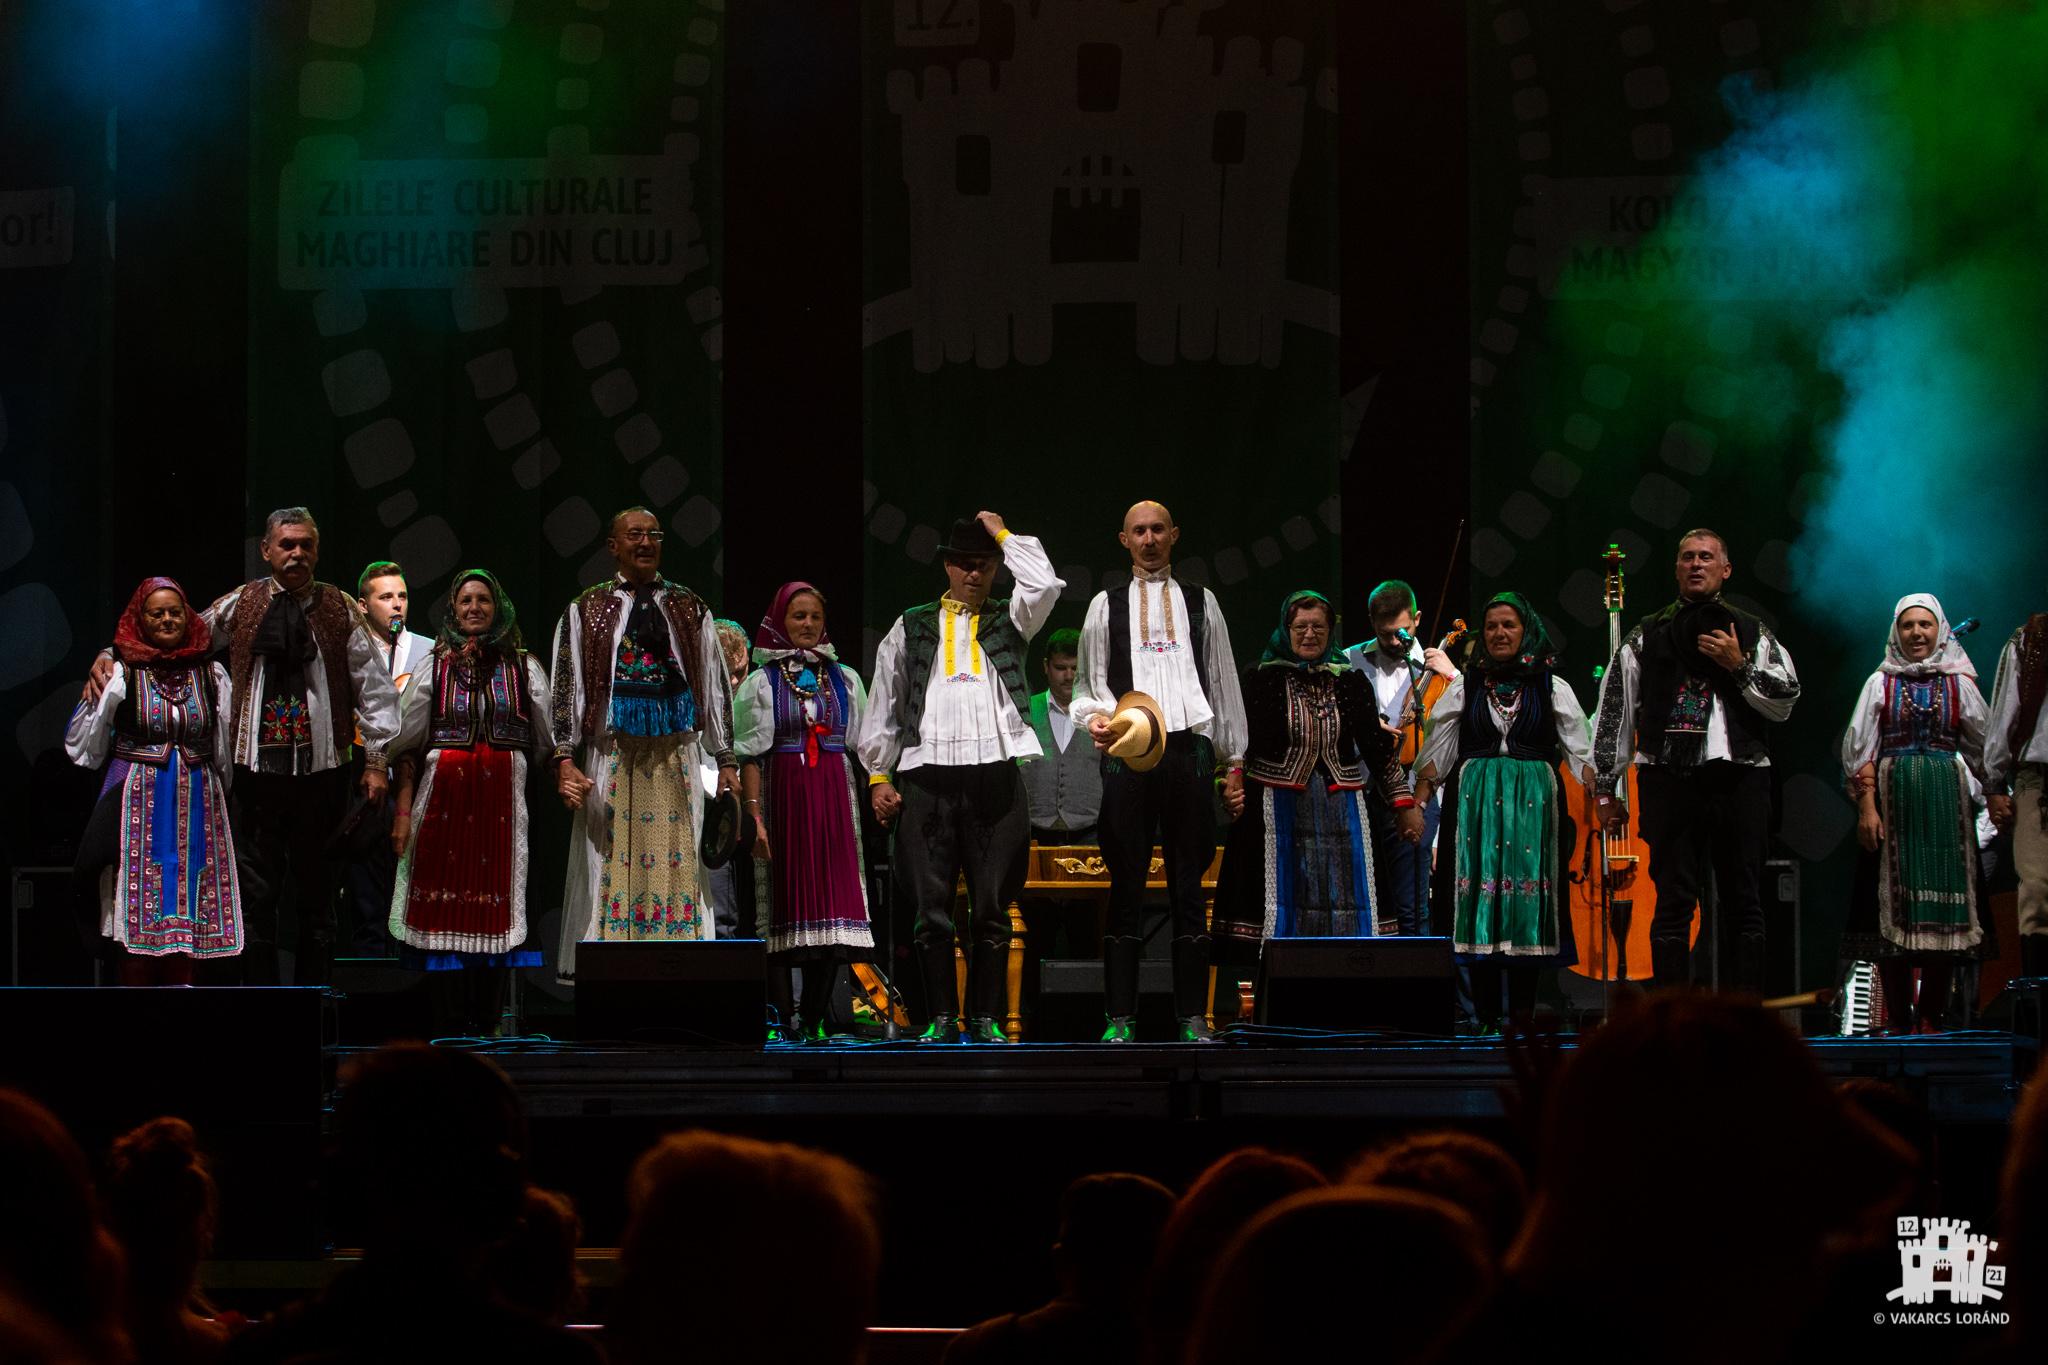 A Tokos zenekar és barátai – 10 éves jubileumi koncert